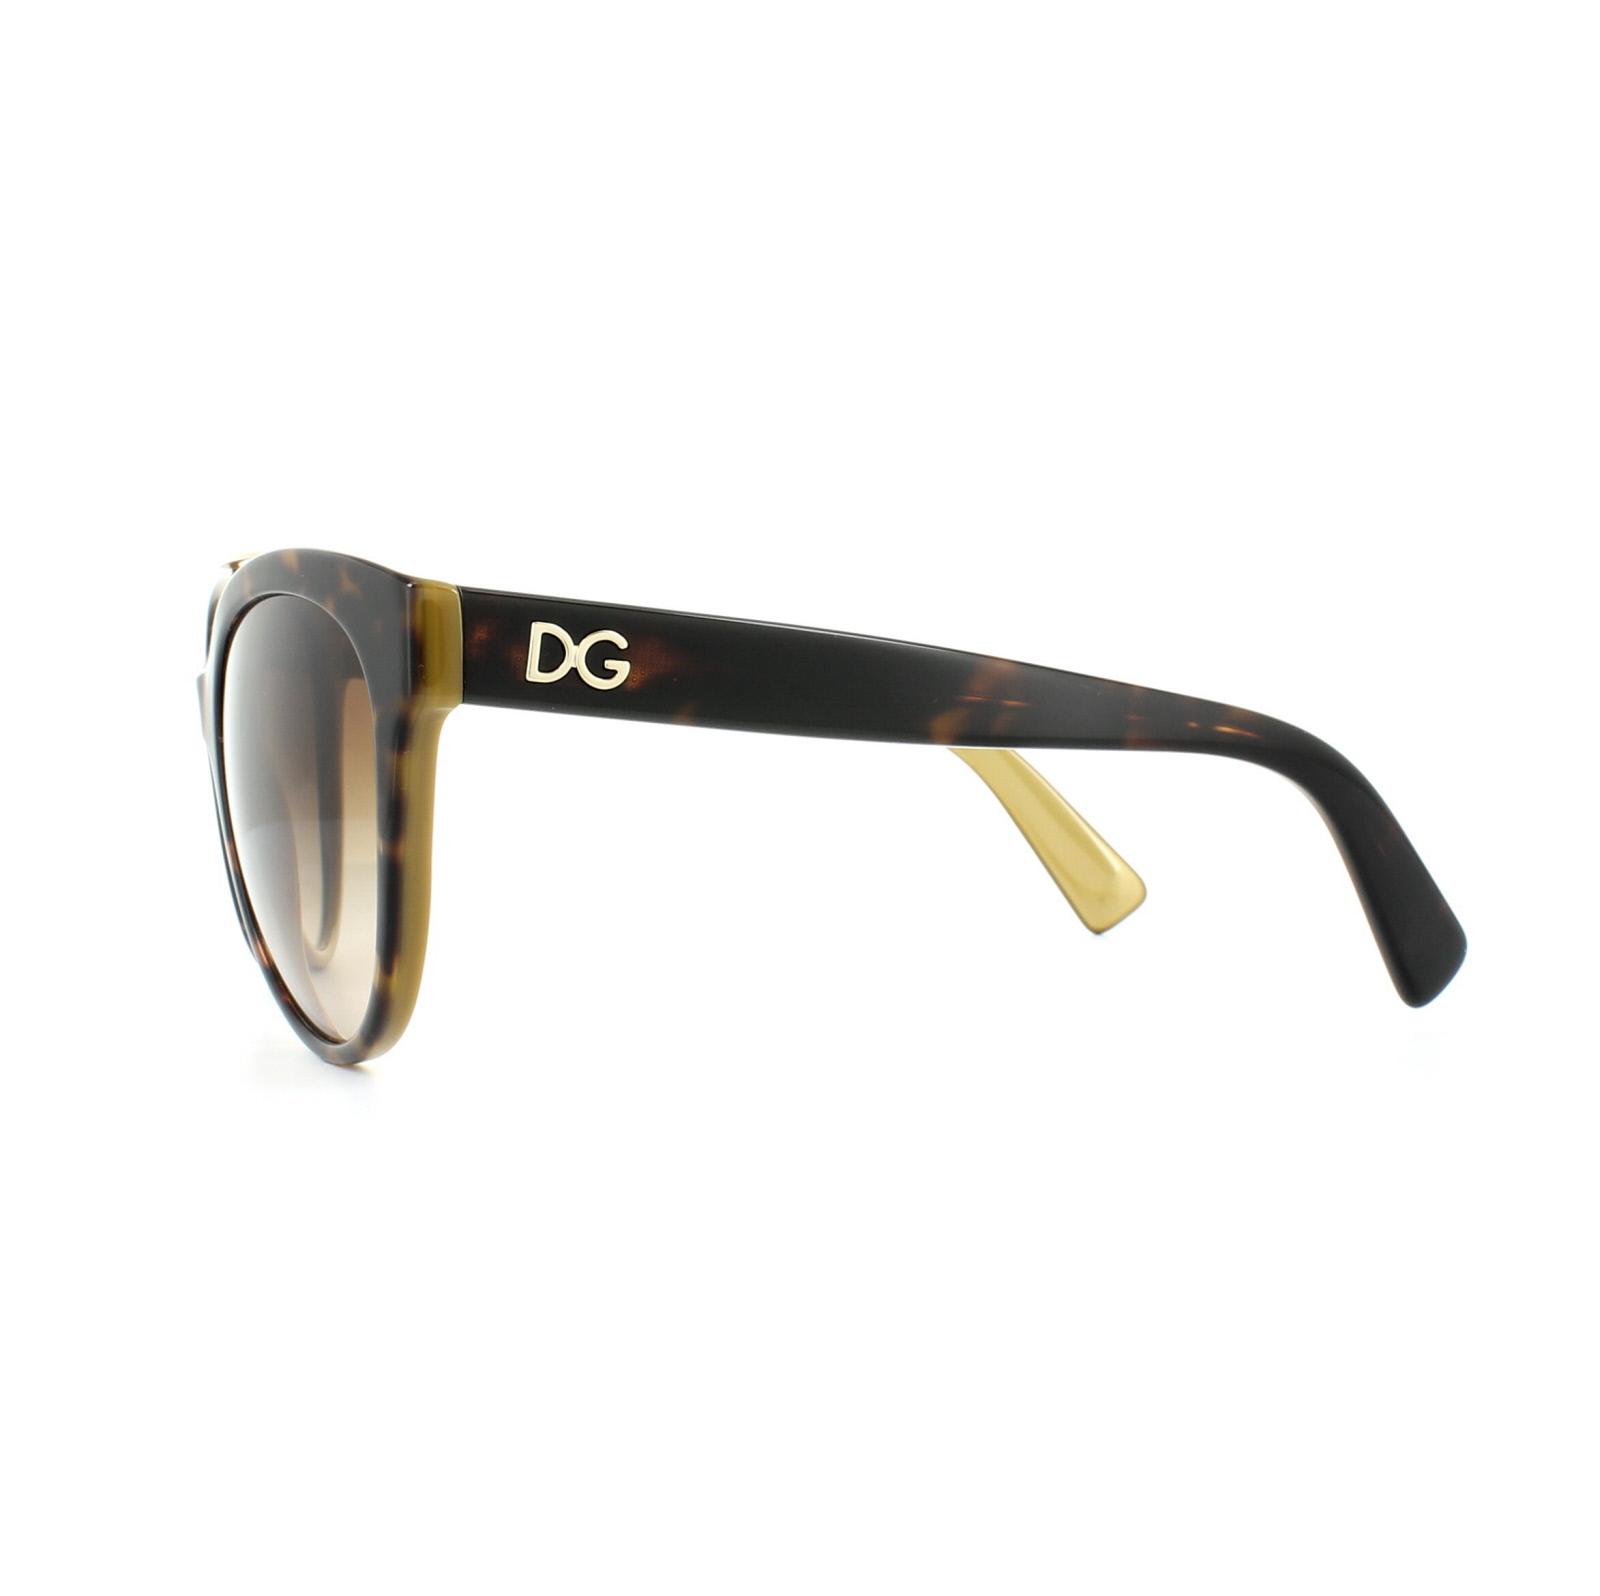 03126ee808 Sentinel Dolce   Gabbana Sunglasses 4280 2956 13 Top Havana on Gold Brown  Gradient